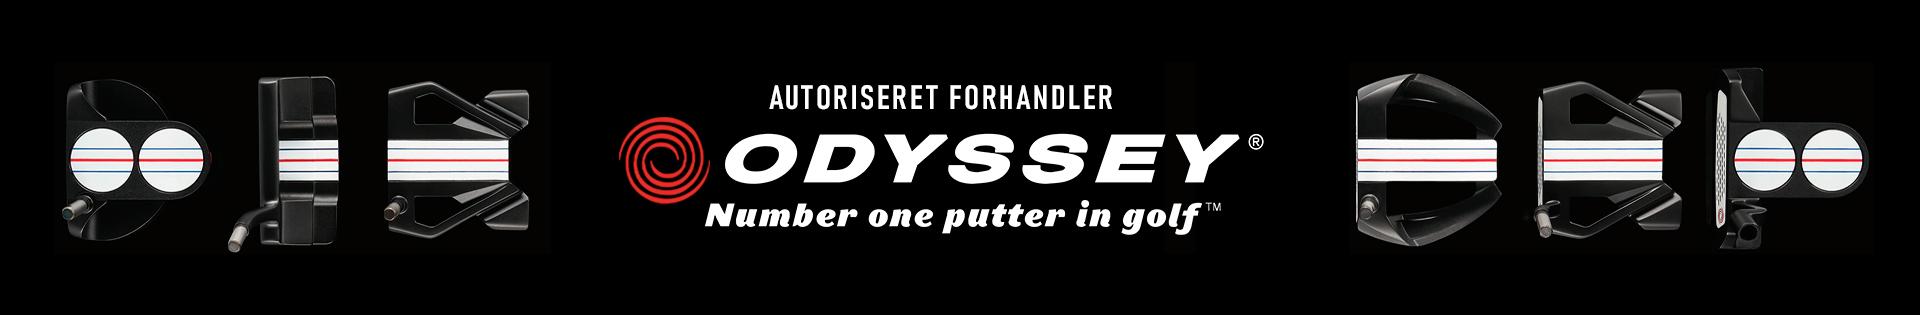 Odyssey Golfudstyr